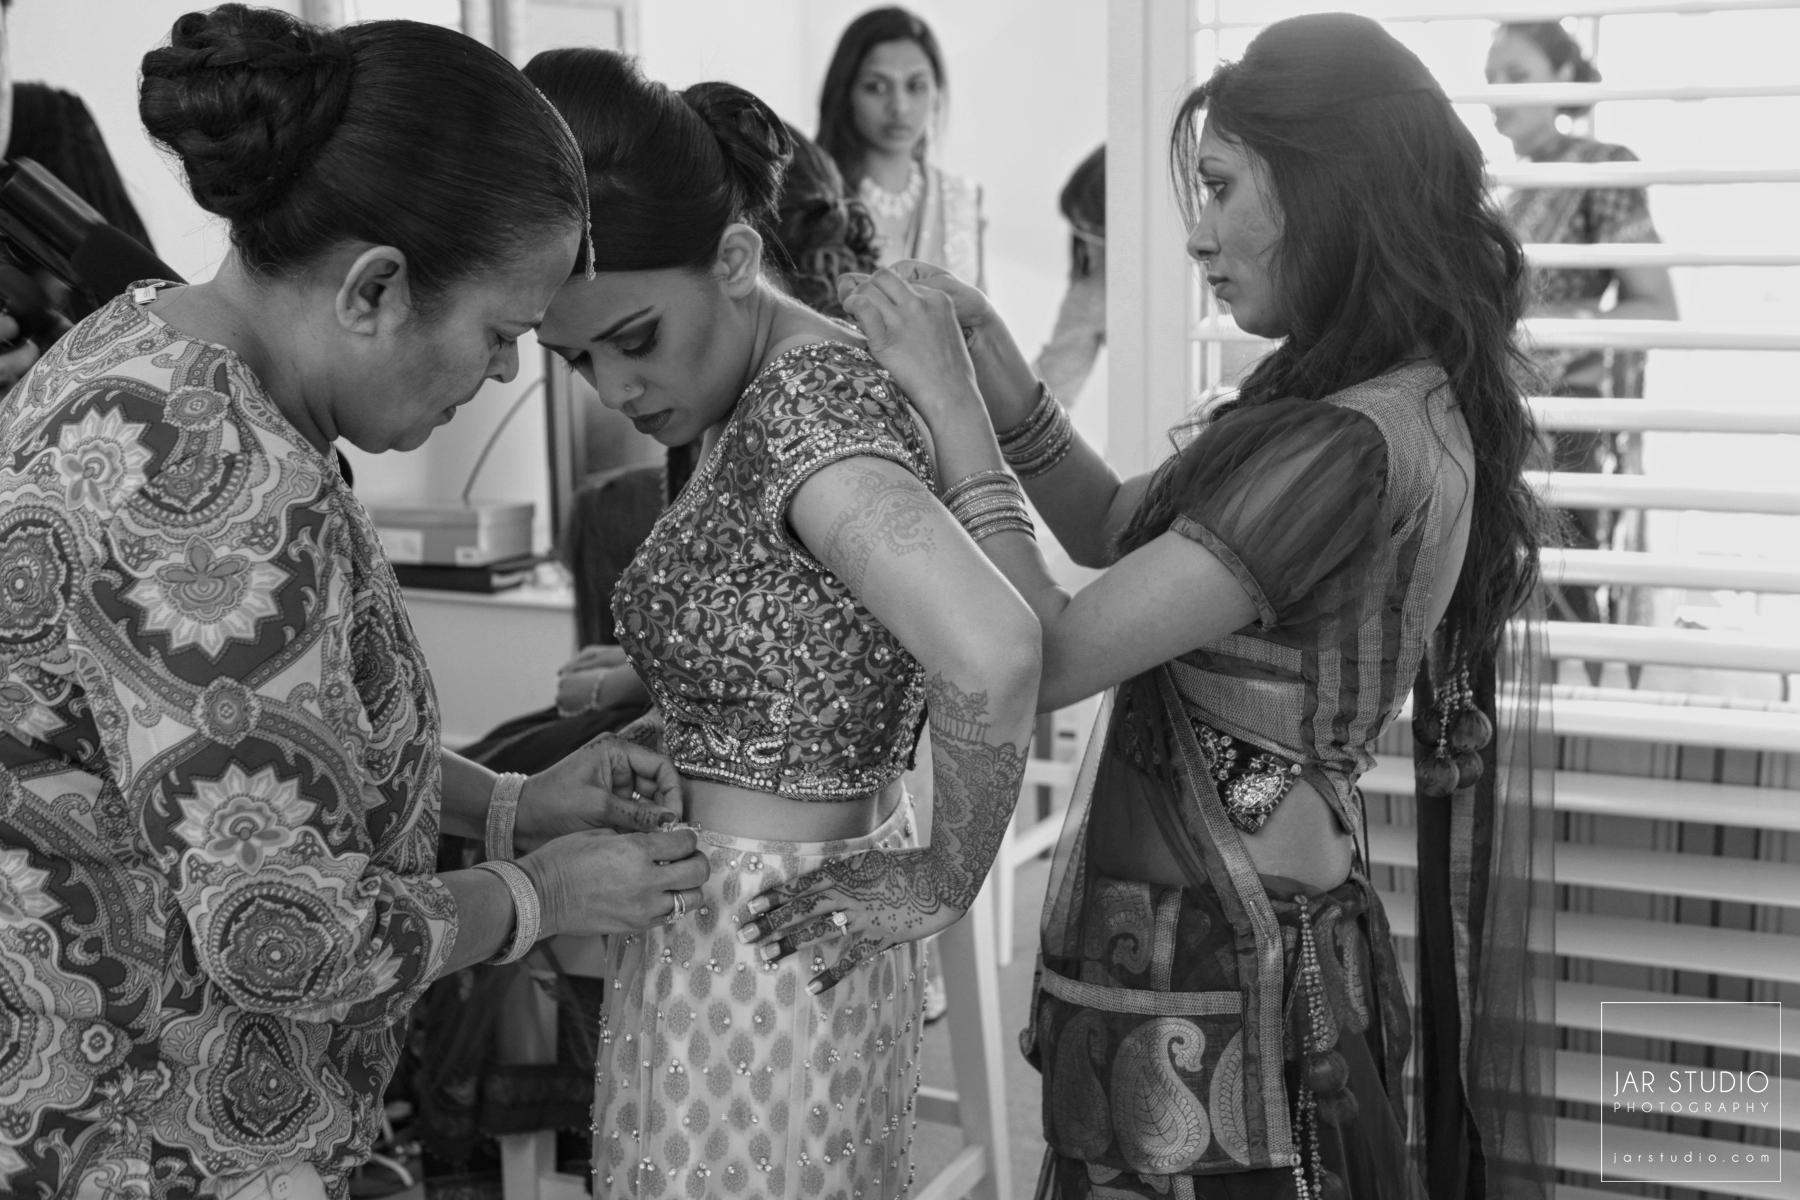 10-fl-indian-bride-getting-ready-jarstudio-photography-orlando.JPG